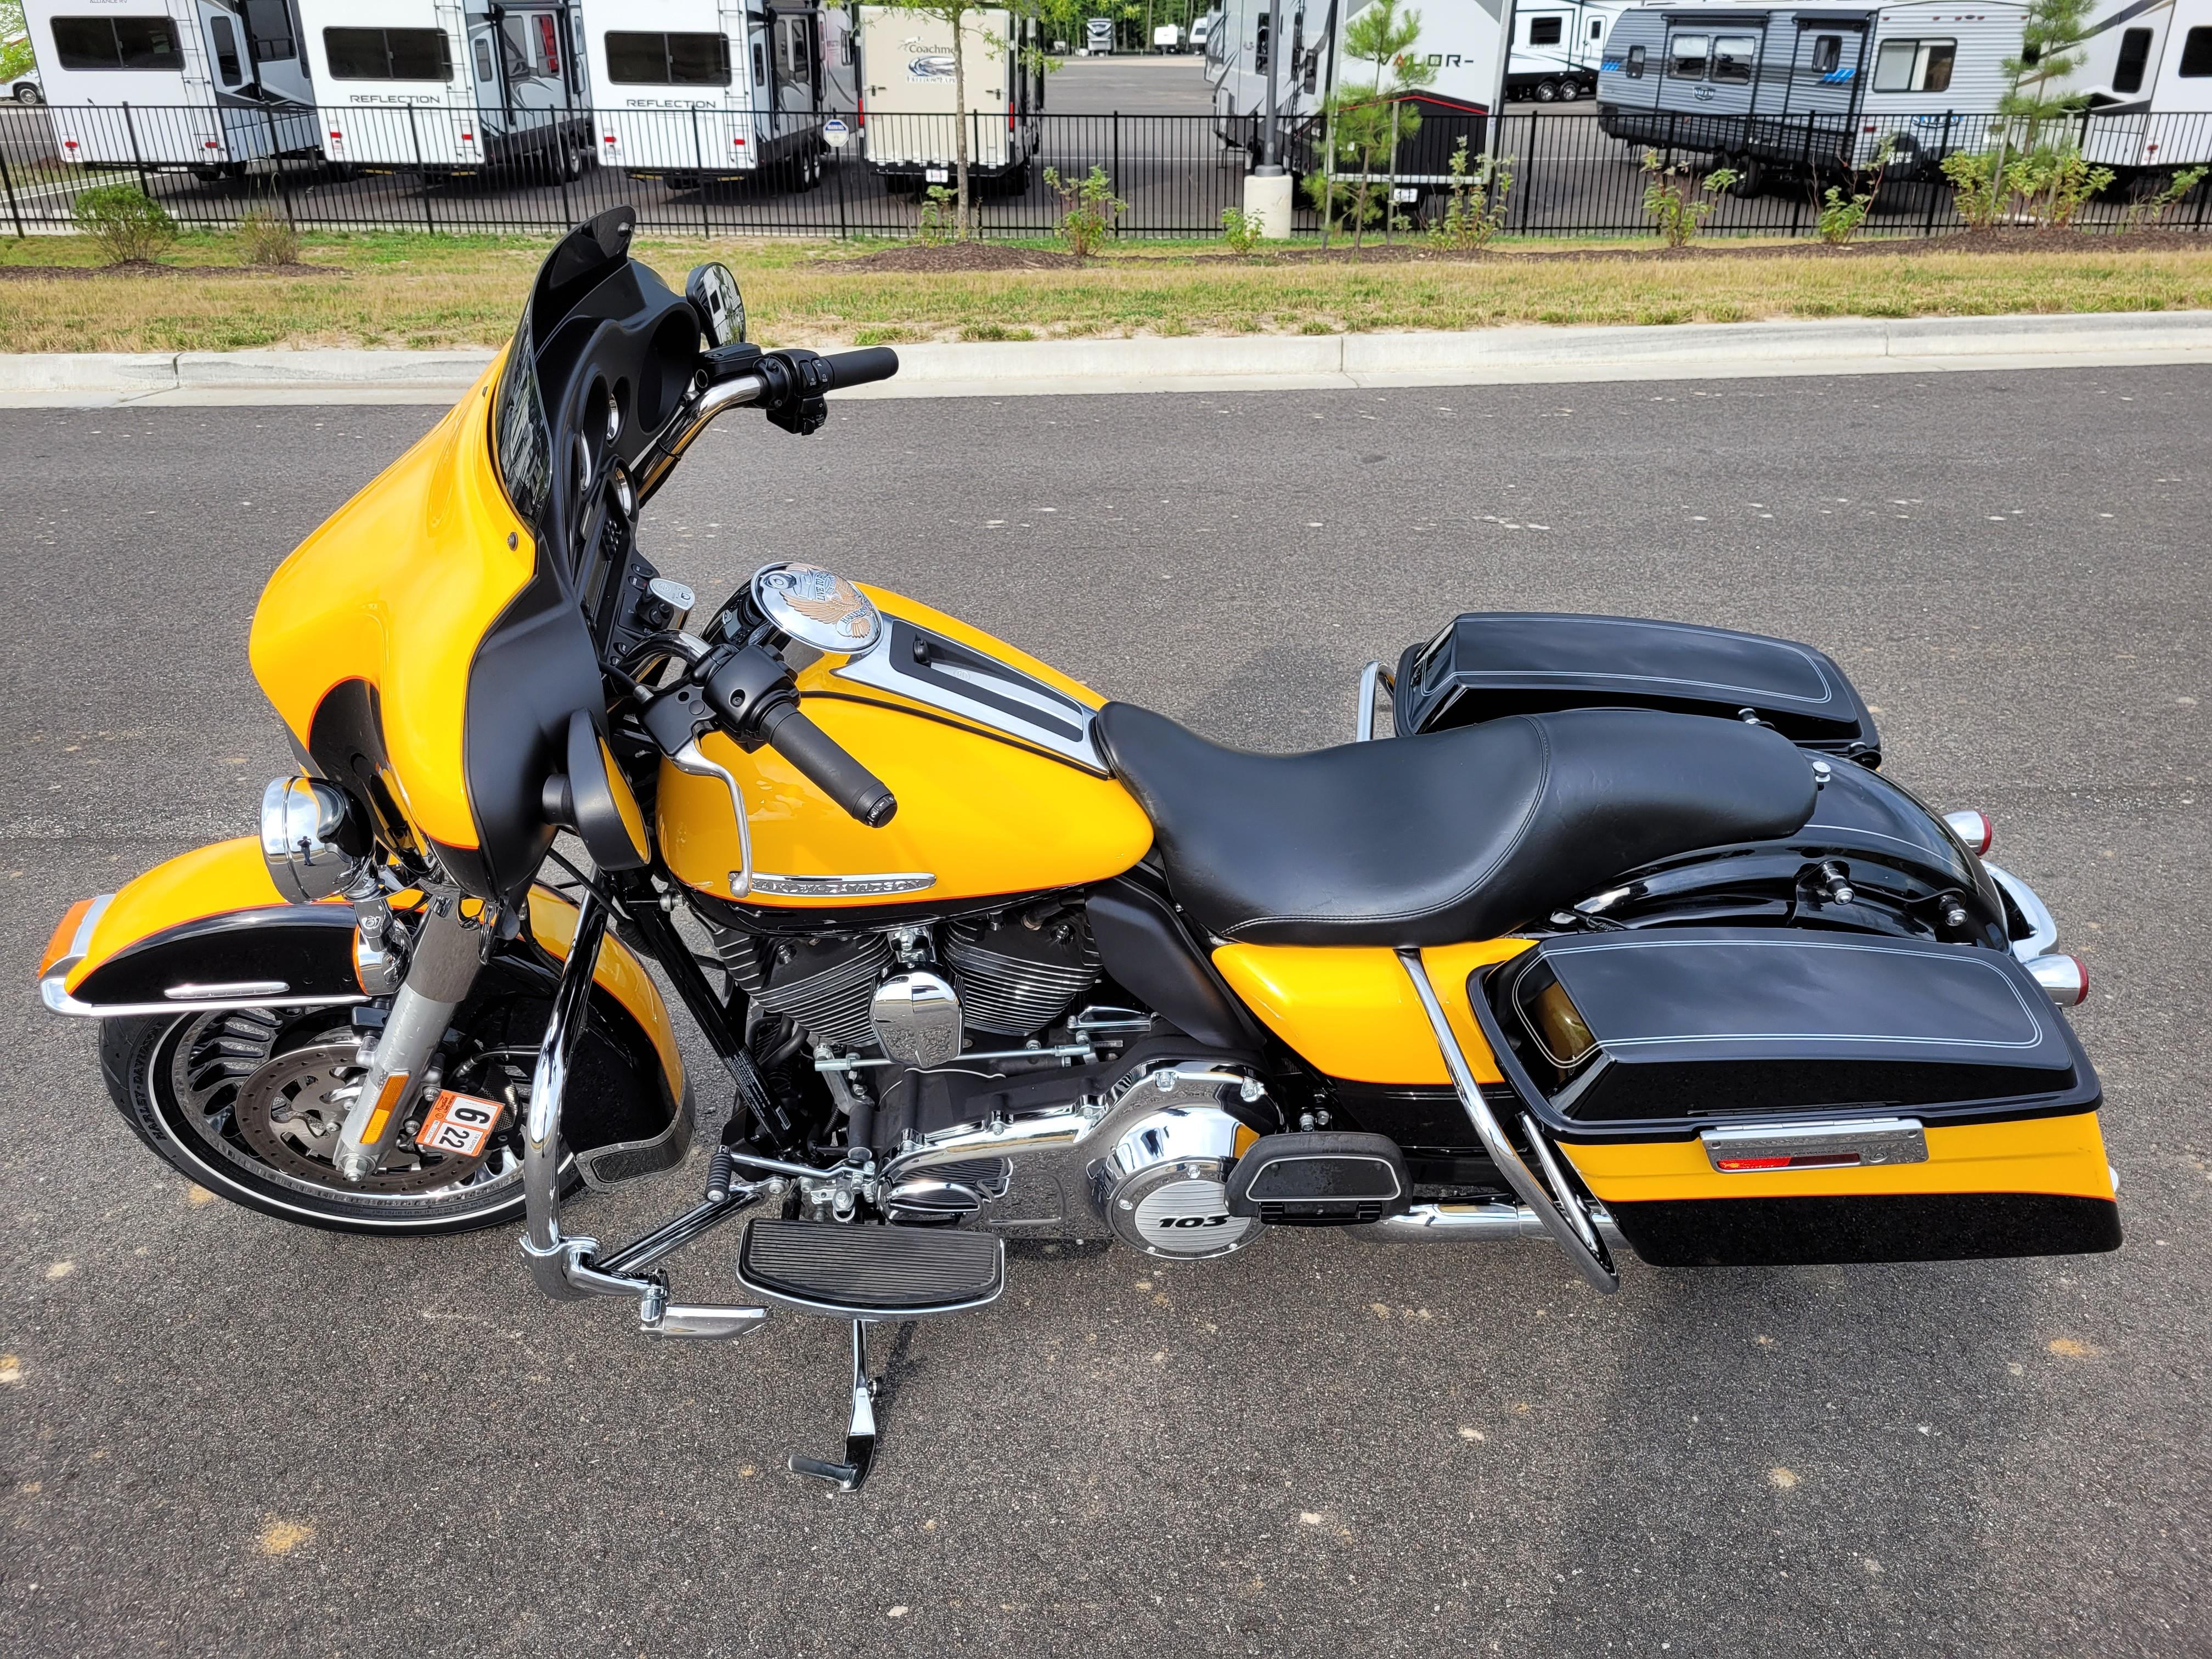 2013 Harley-Davidson Electra Glide Ultra Limited at Richmond Harley-Davidson